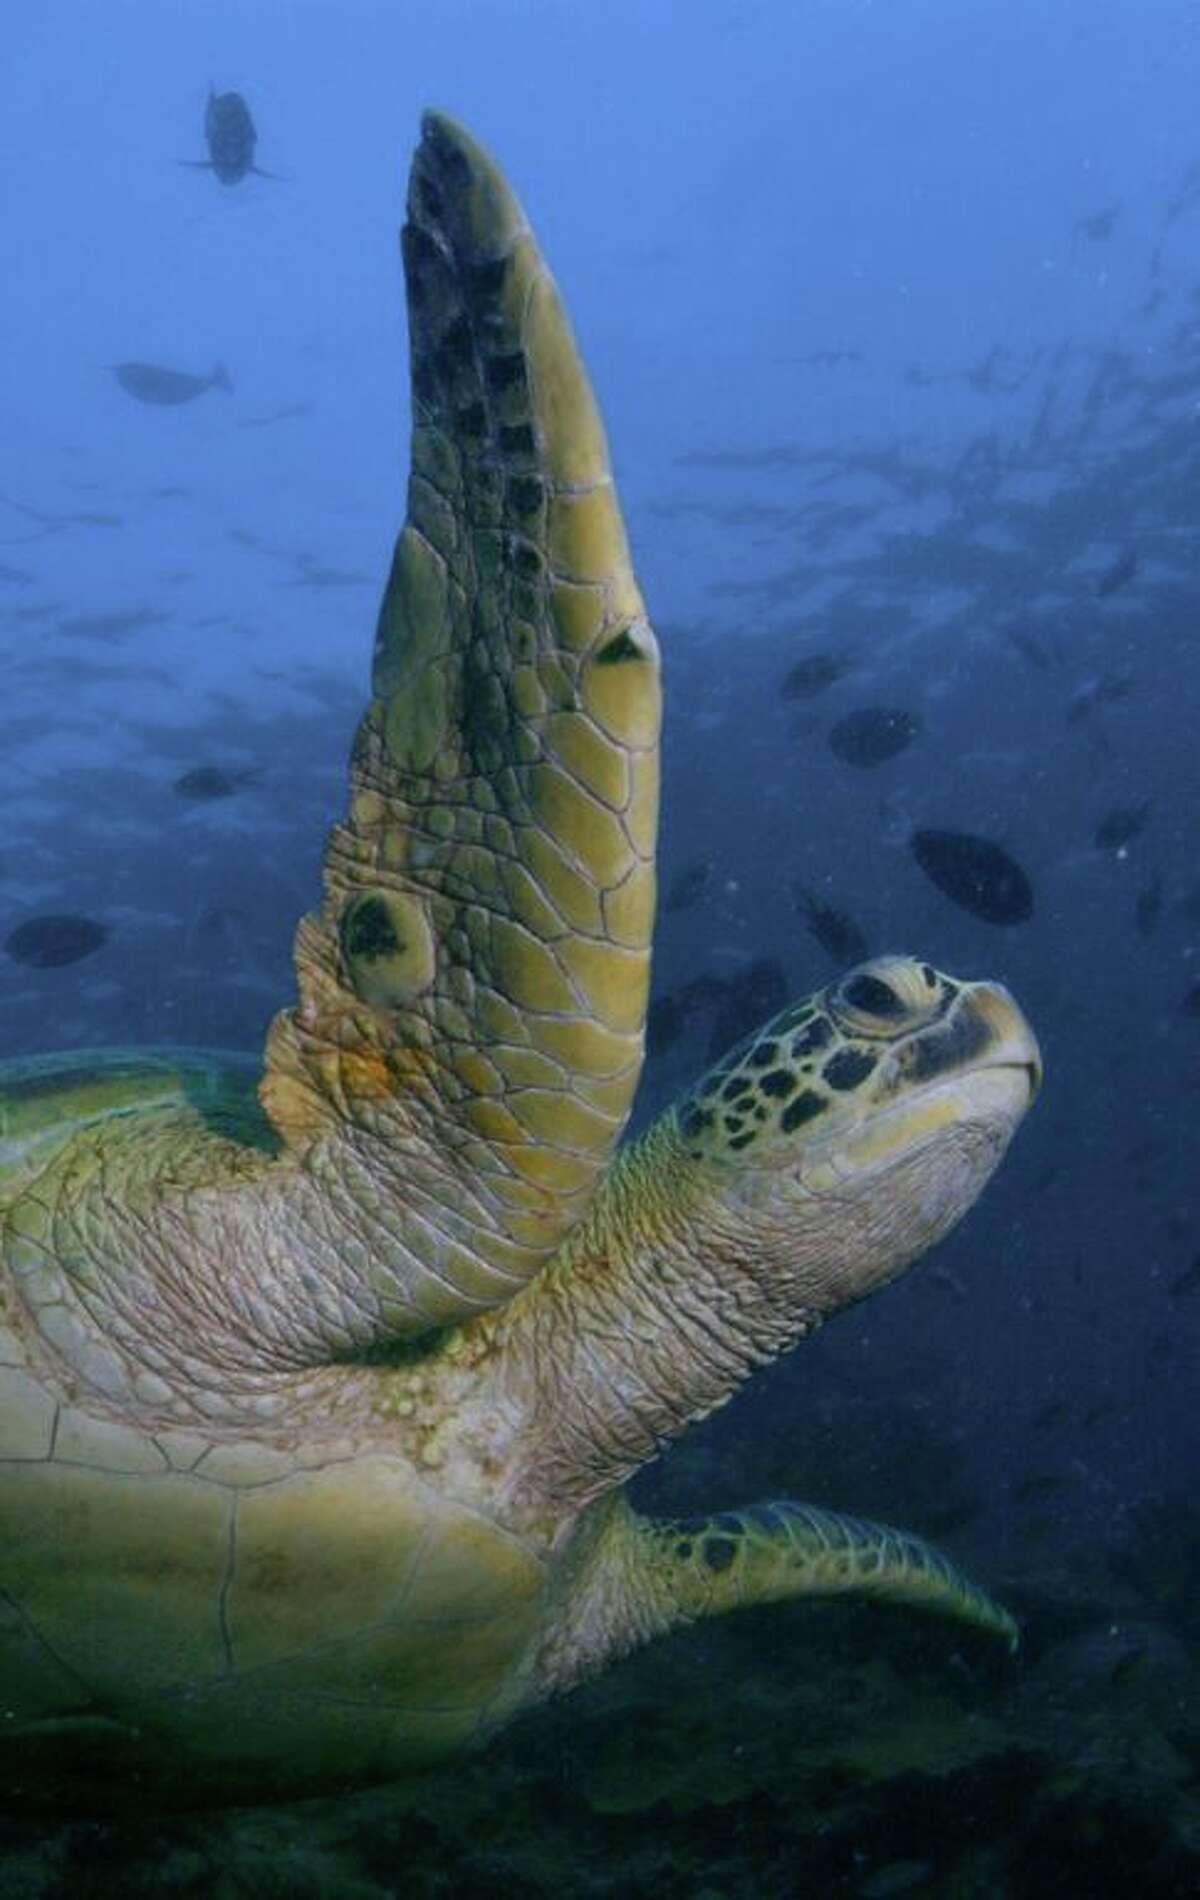 A green sea turtle at Tortuga Cay at the Texas State Aquarium in Corpus Christi.